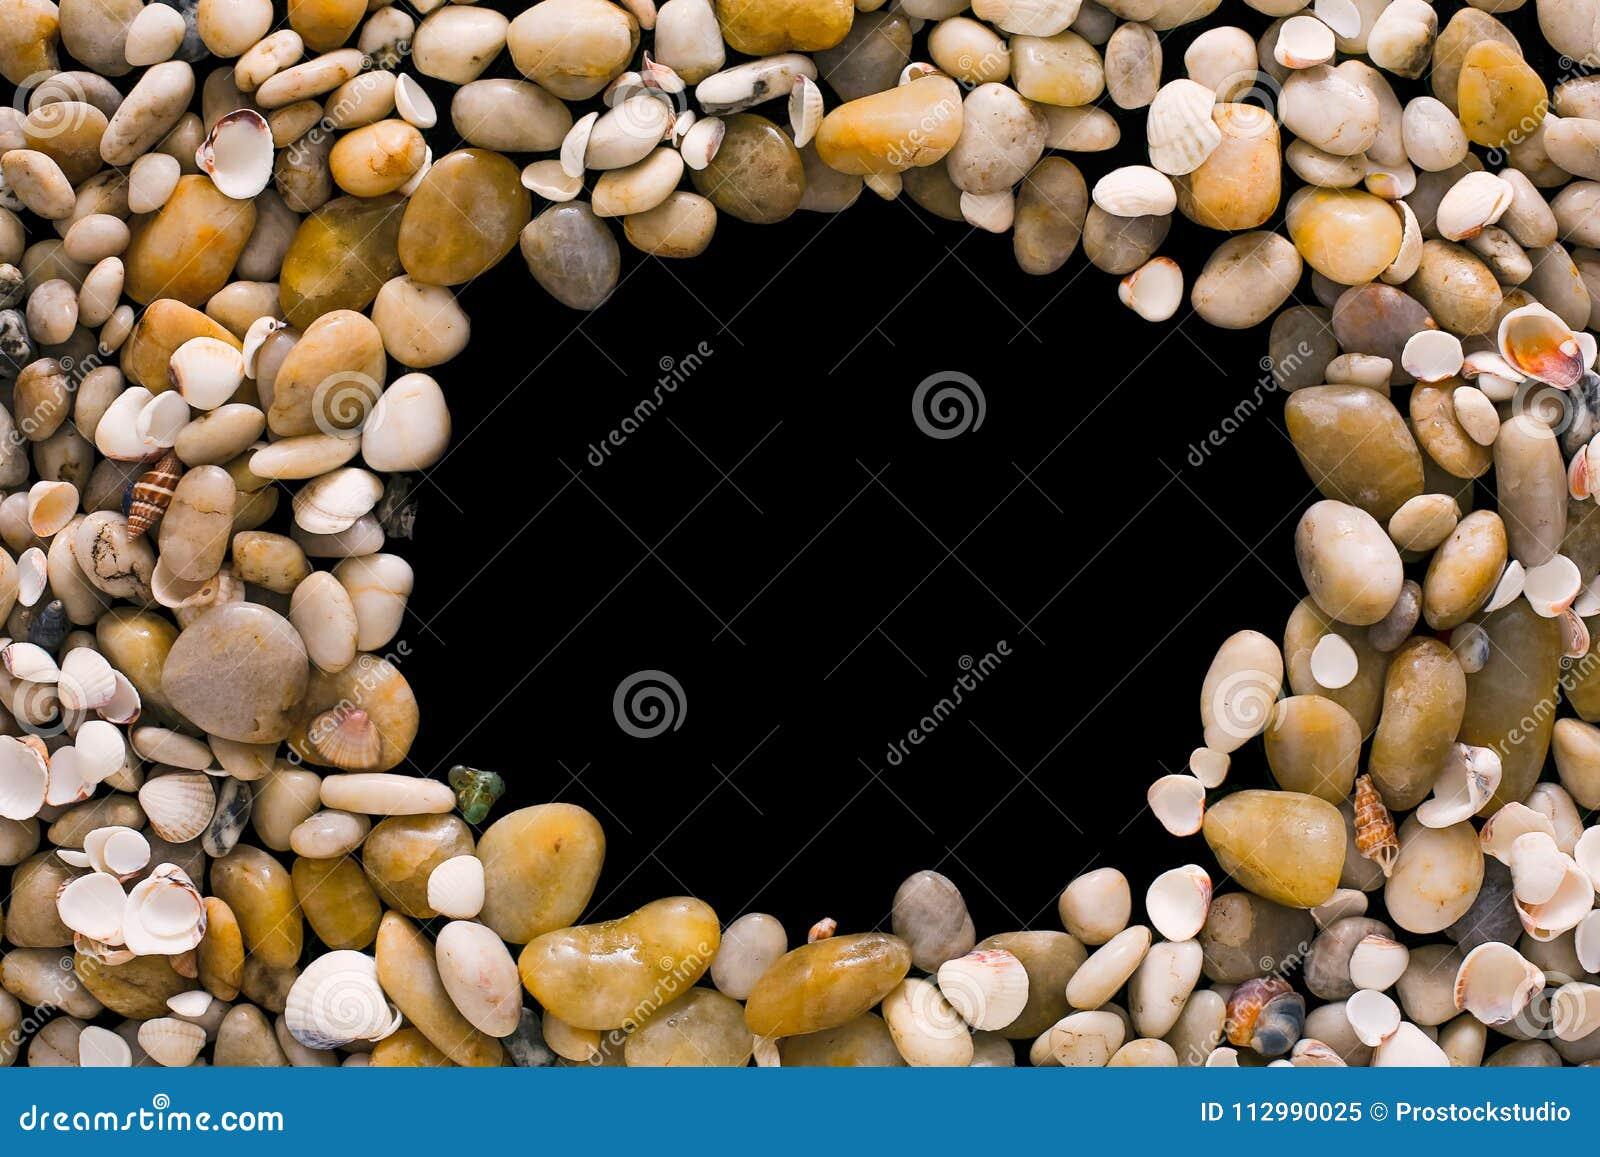 Seashells and pebbles on black background, natural seashore stones